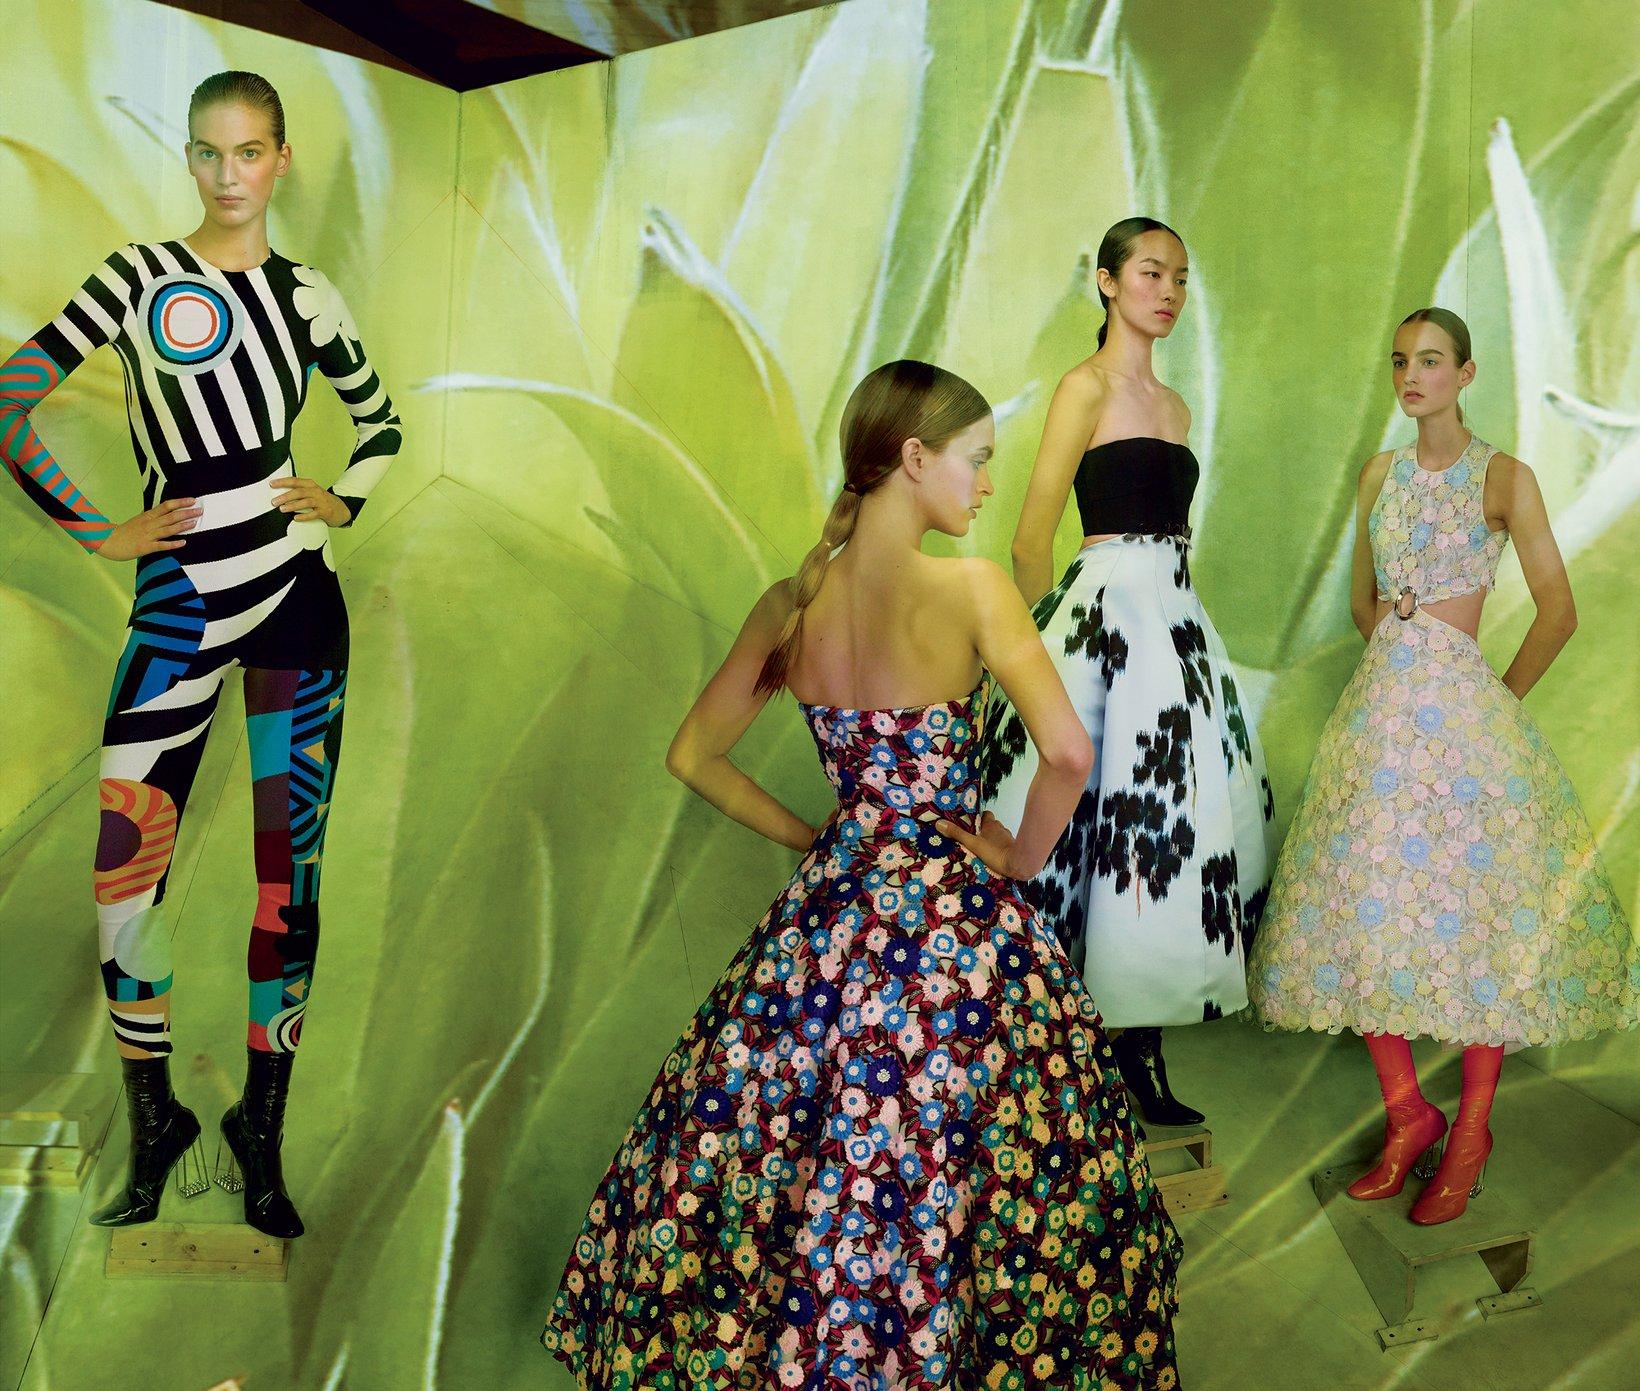 Vanessa Axente,Mirte Maas,Fei Fei Sun,and Maartje Verhoof,all in Christian Dior Haute Couture.